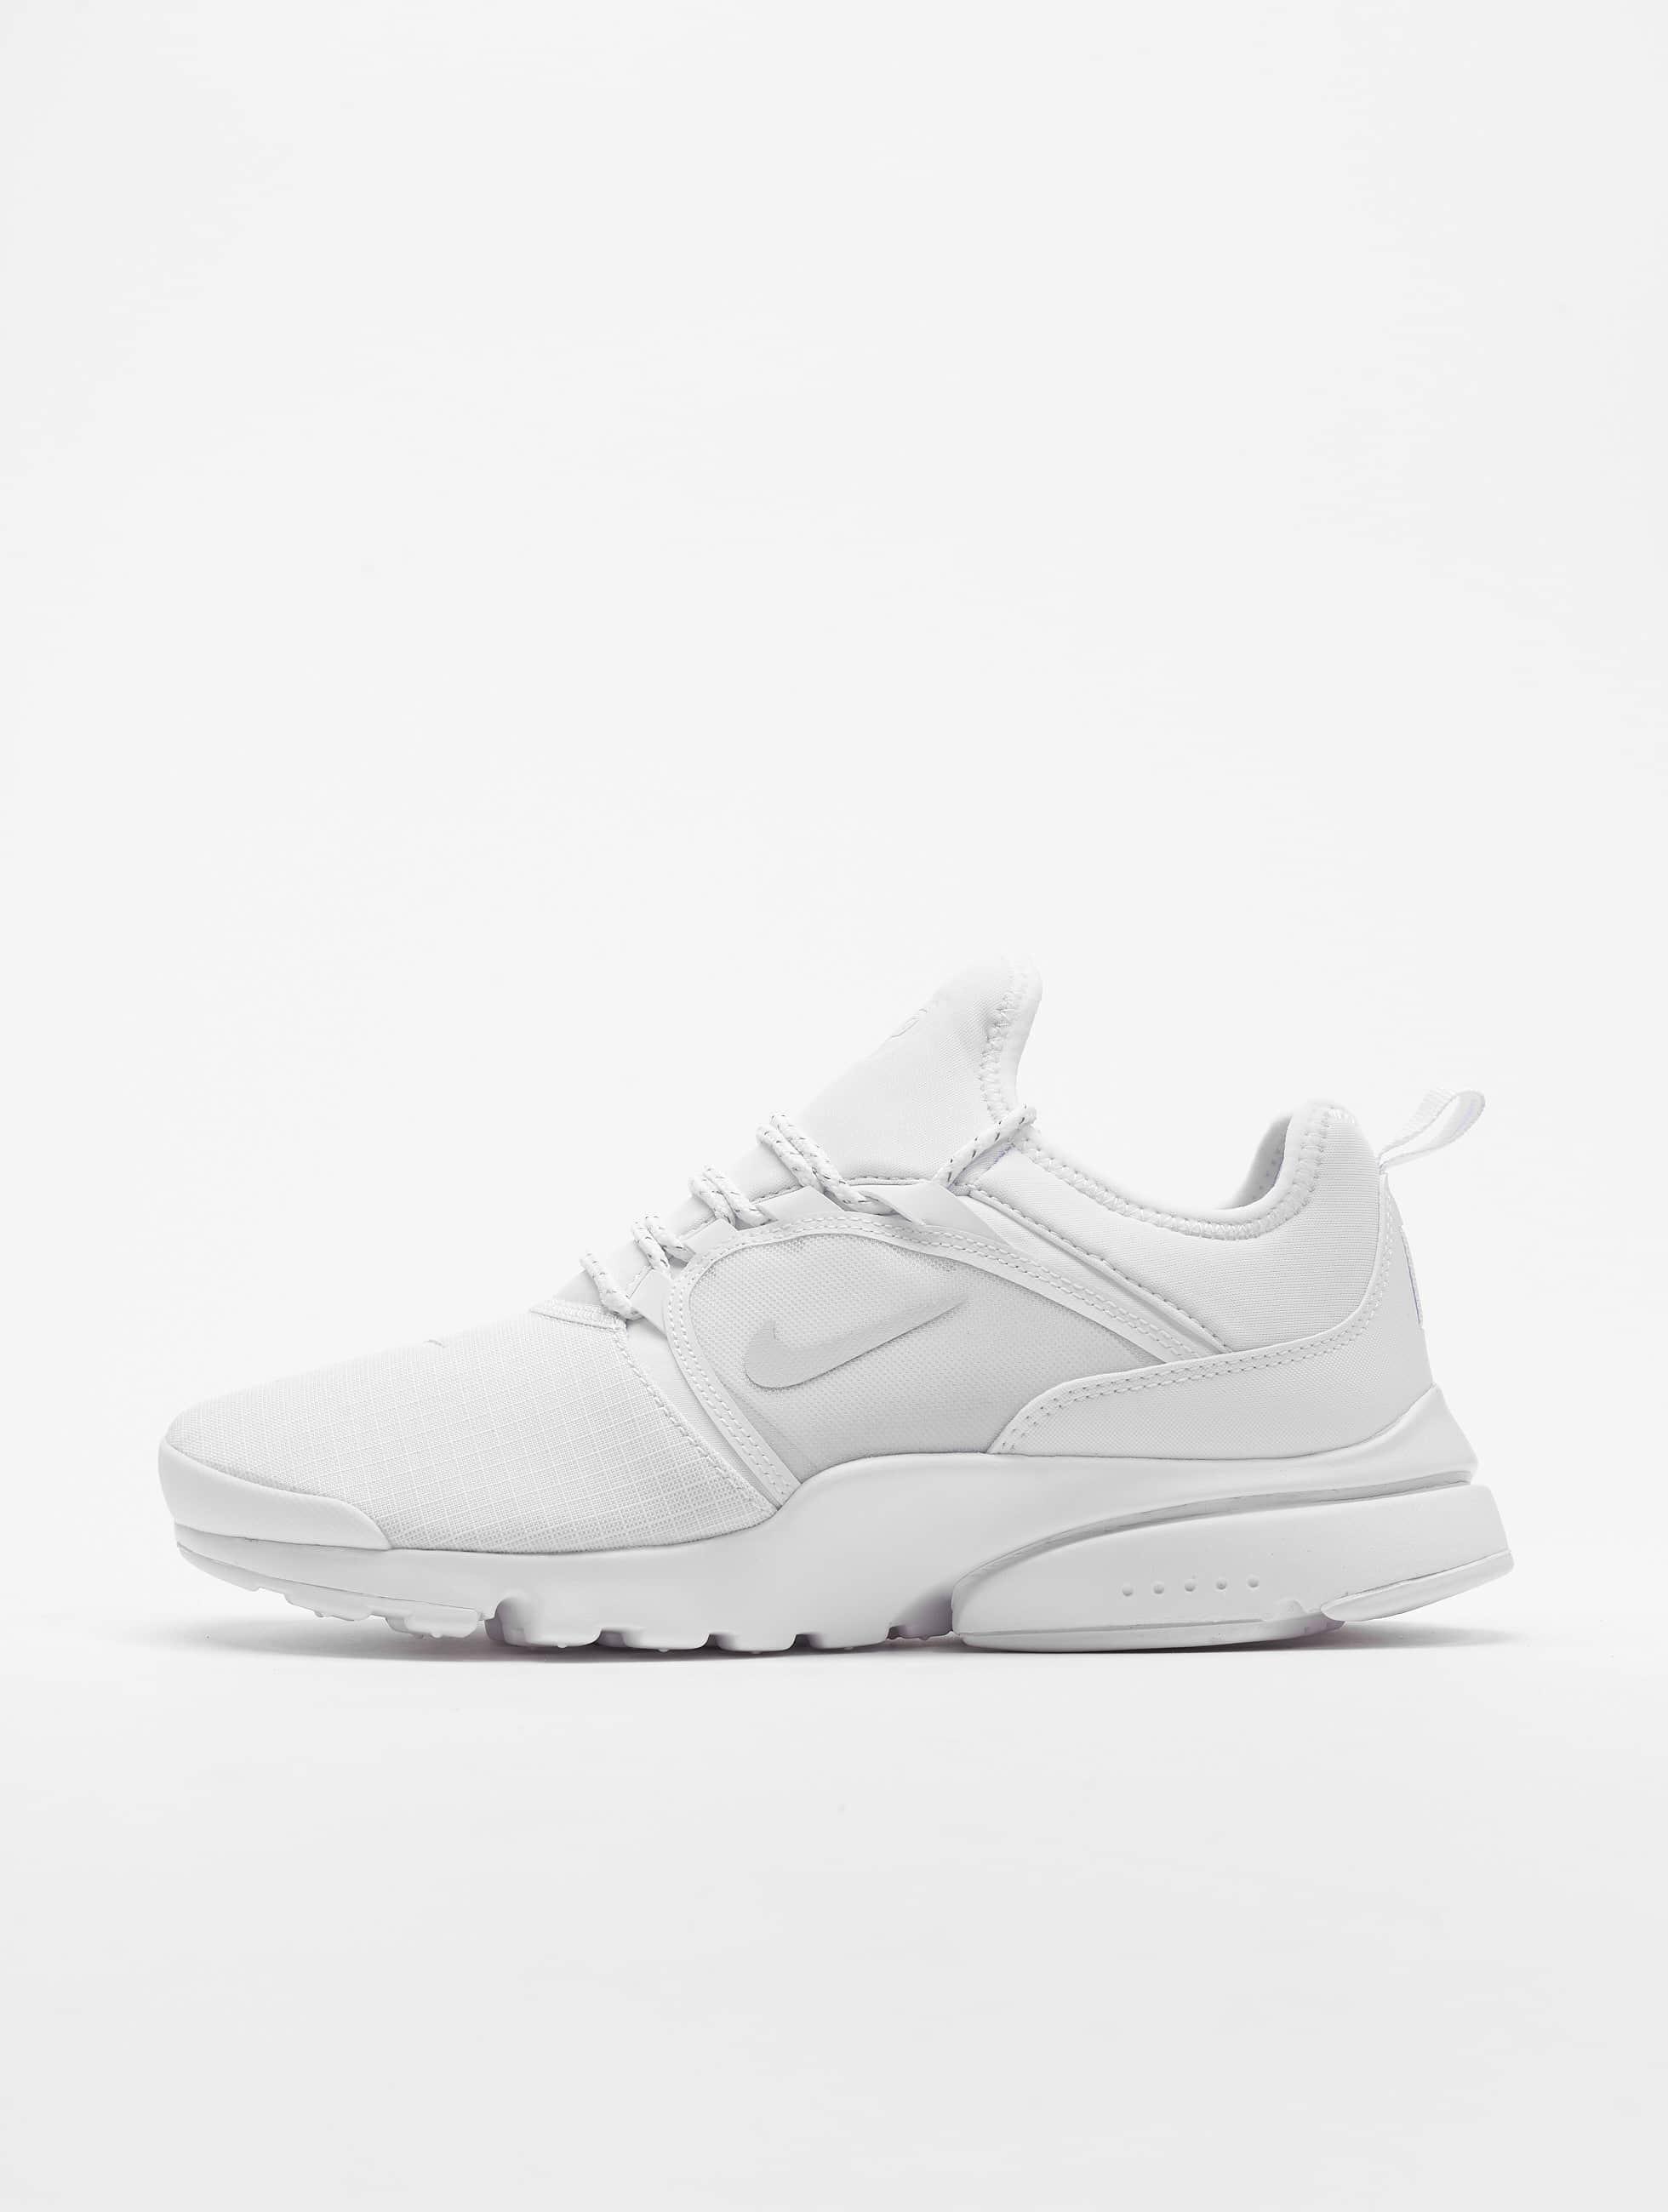 Basses Nike Presto Femme FlySneakers H2WD9IE